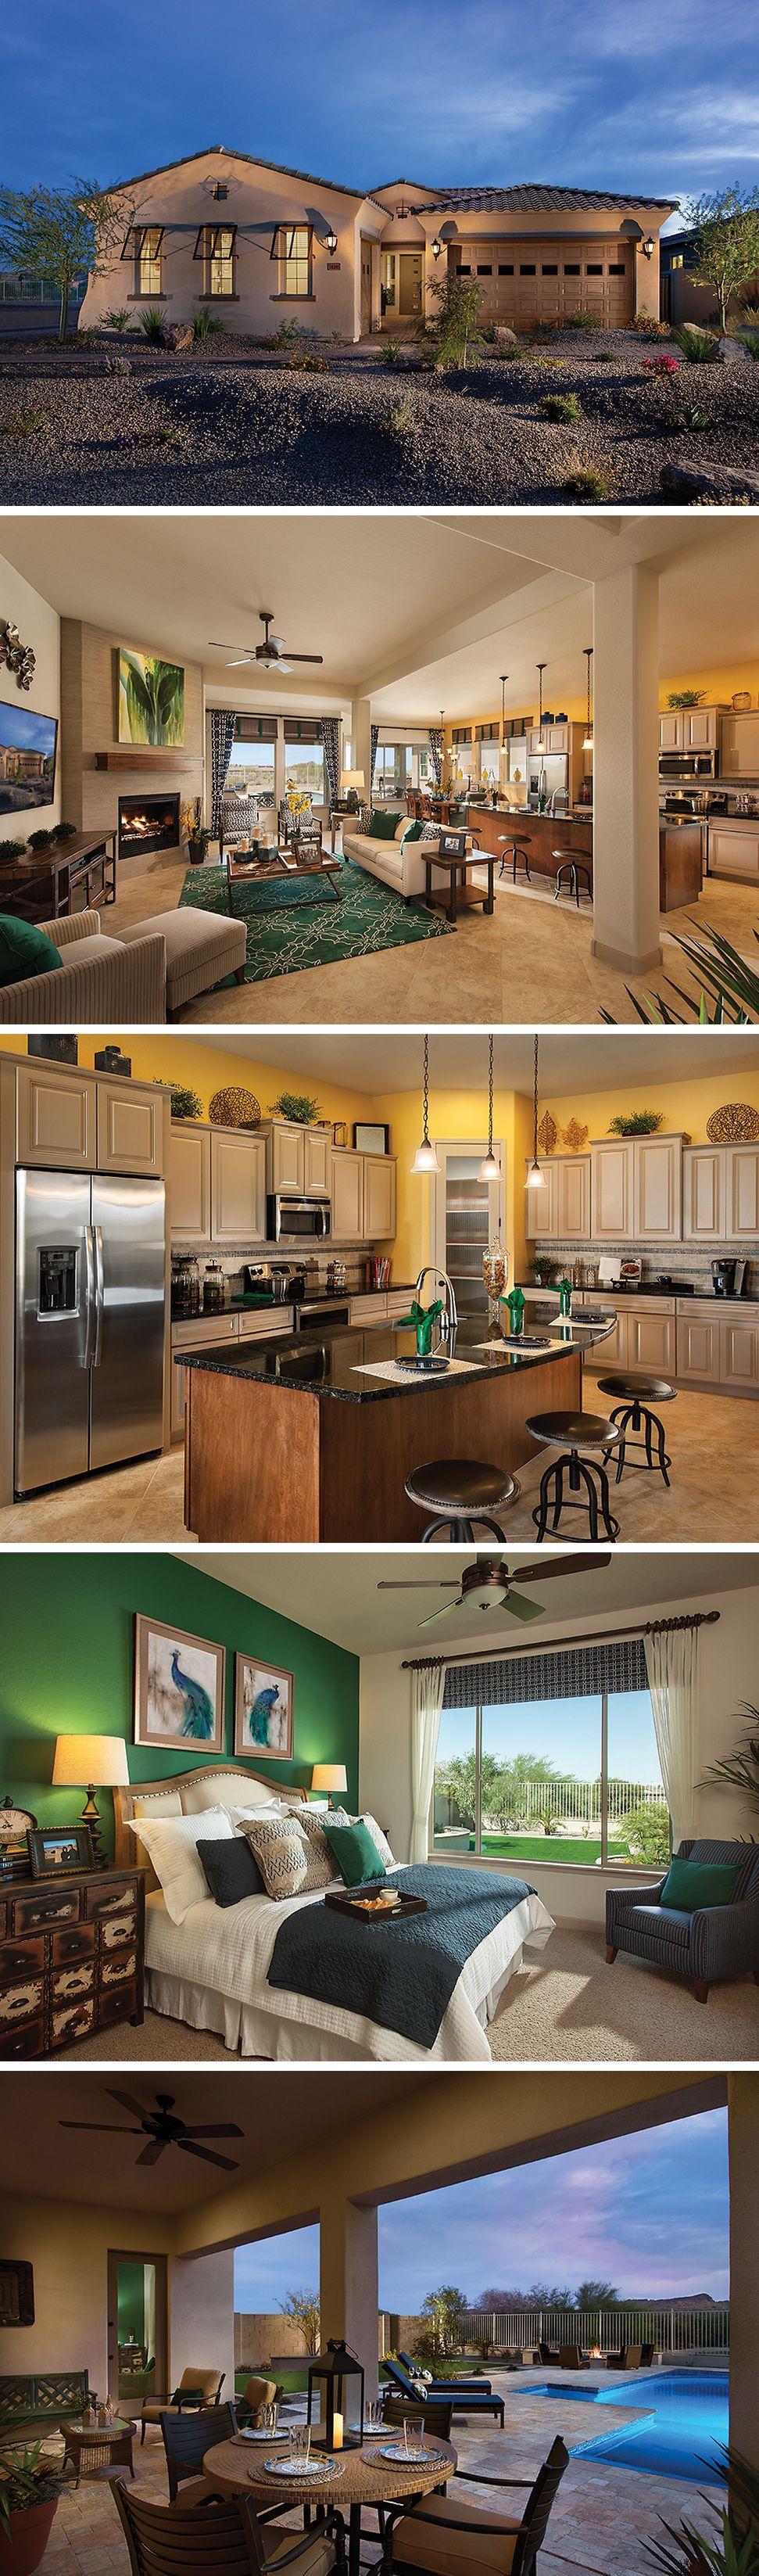 The DeSosa by David Weekley Homes located in Golf Canyon at Estrella ...